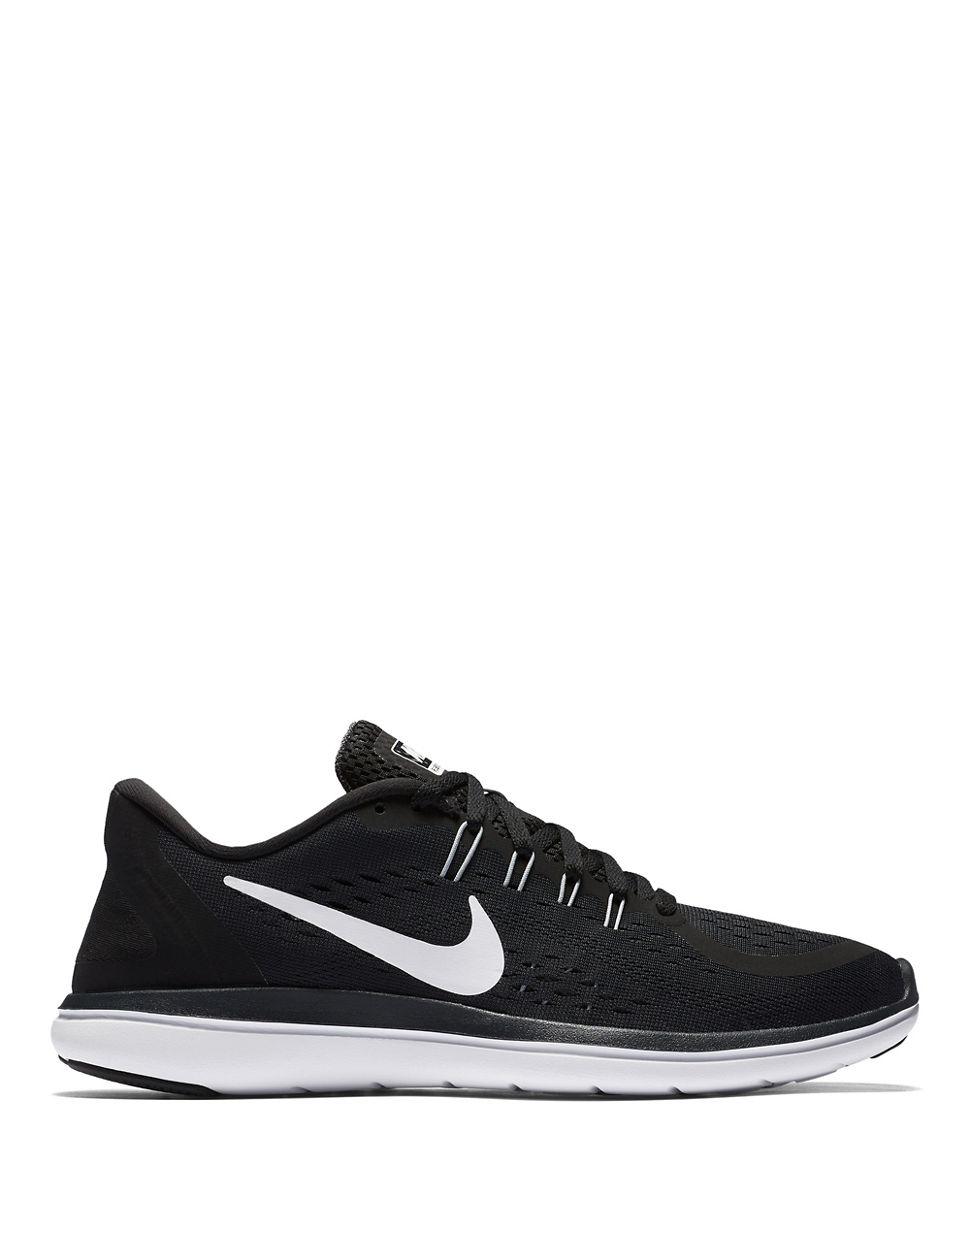 Nike Roshe Two Flyknit 365 Dam Billigt,Nike Air Max Modern Dam